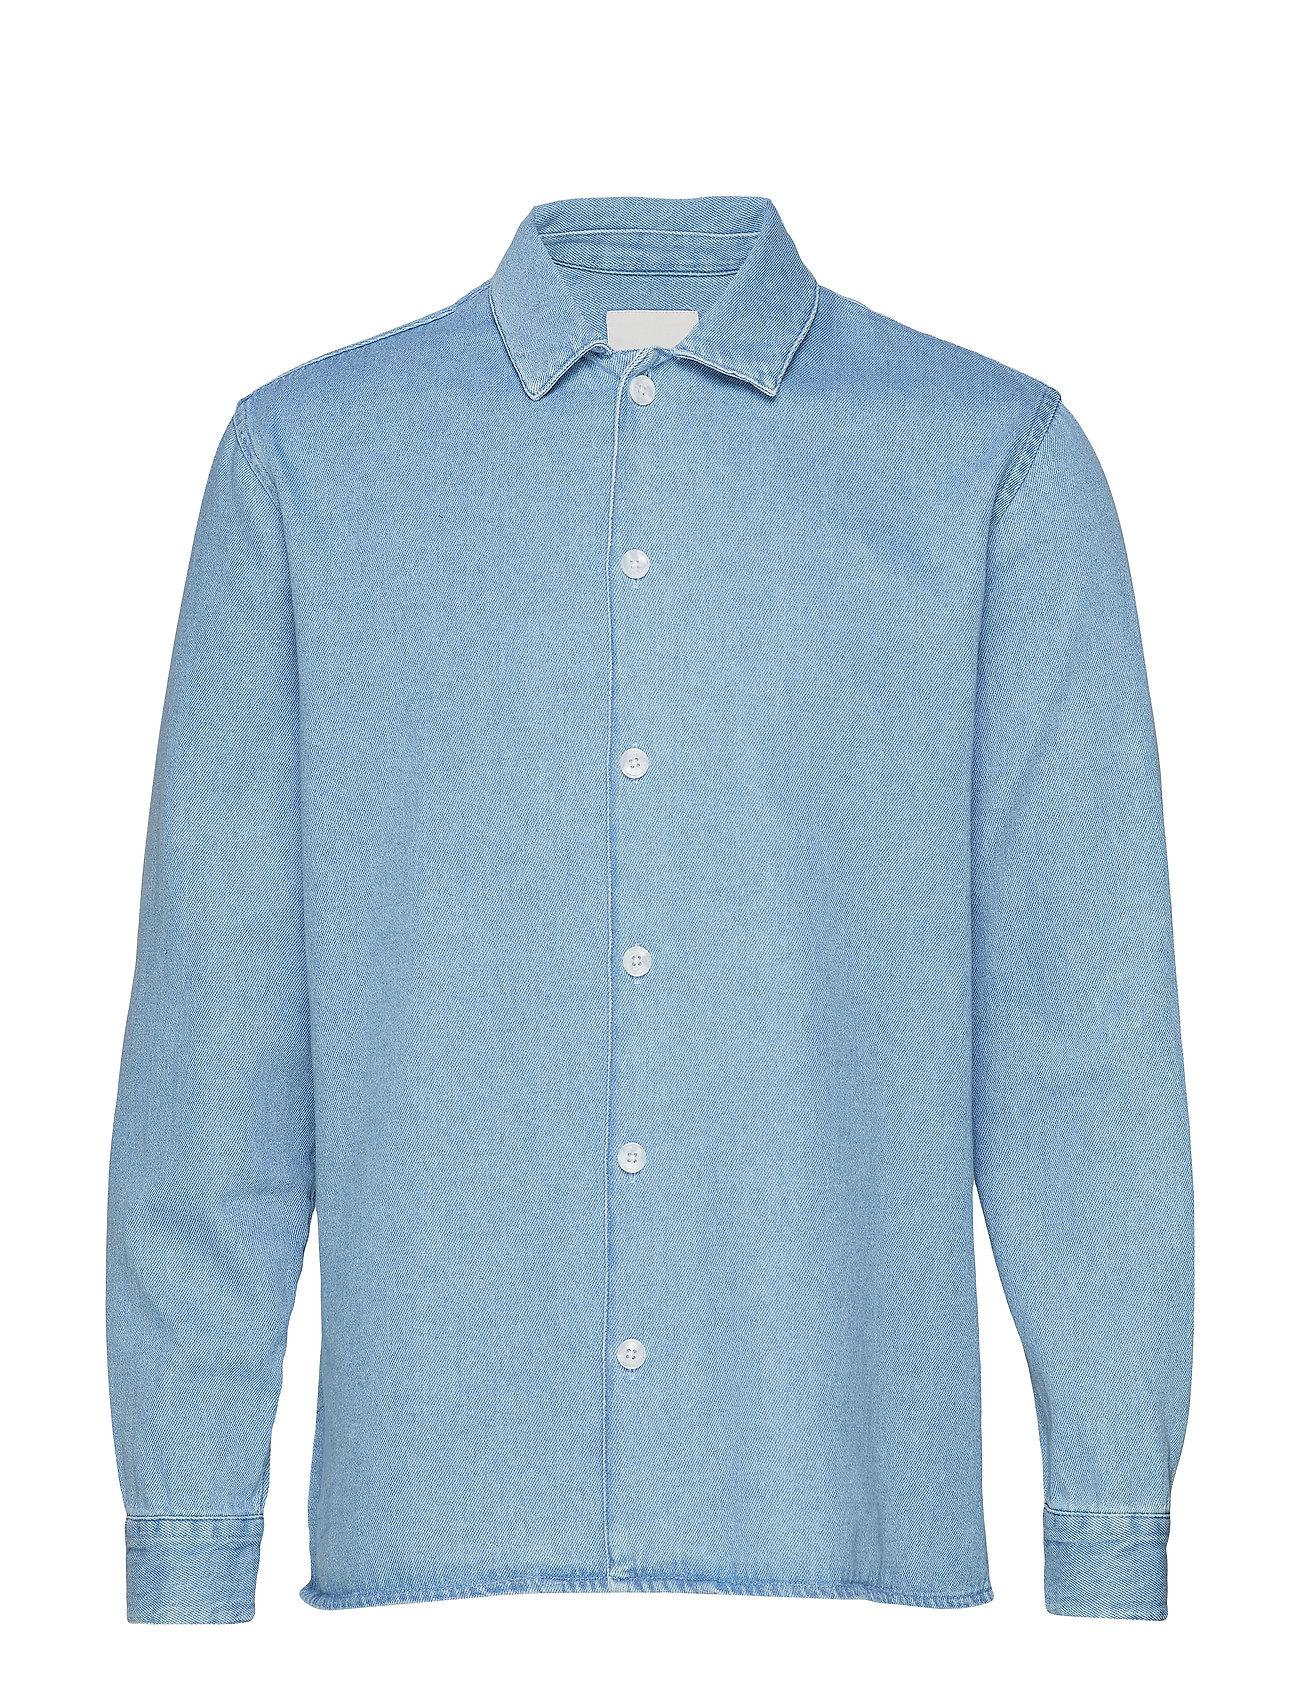 Minimum linnet - INDIGO BLUE